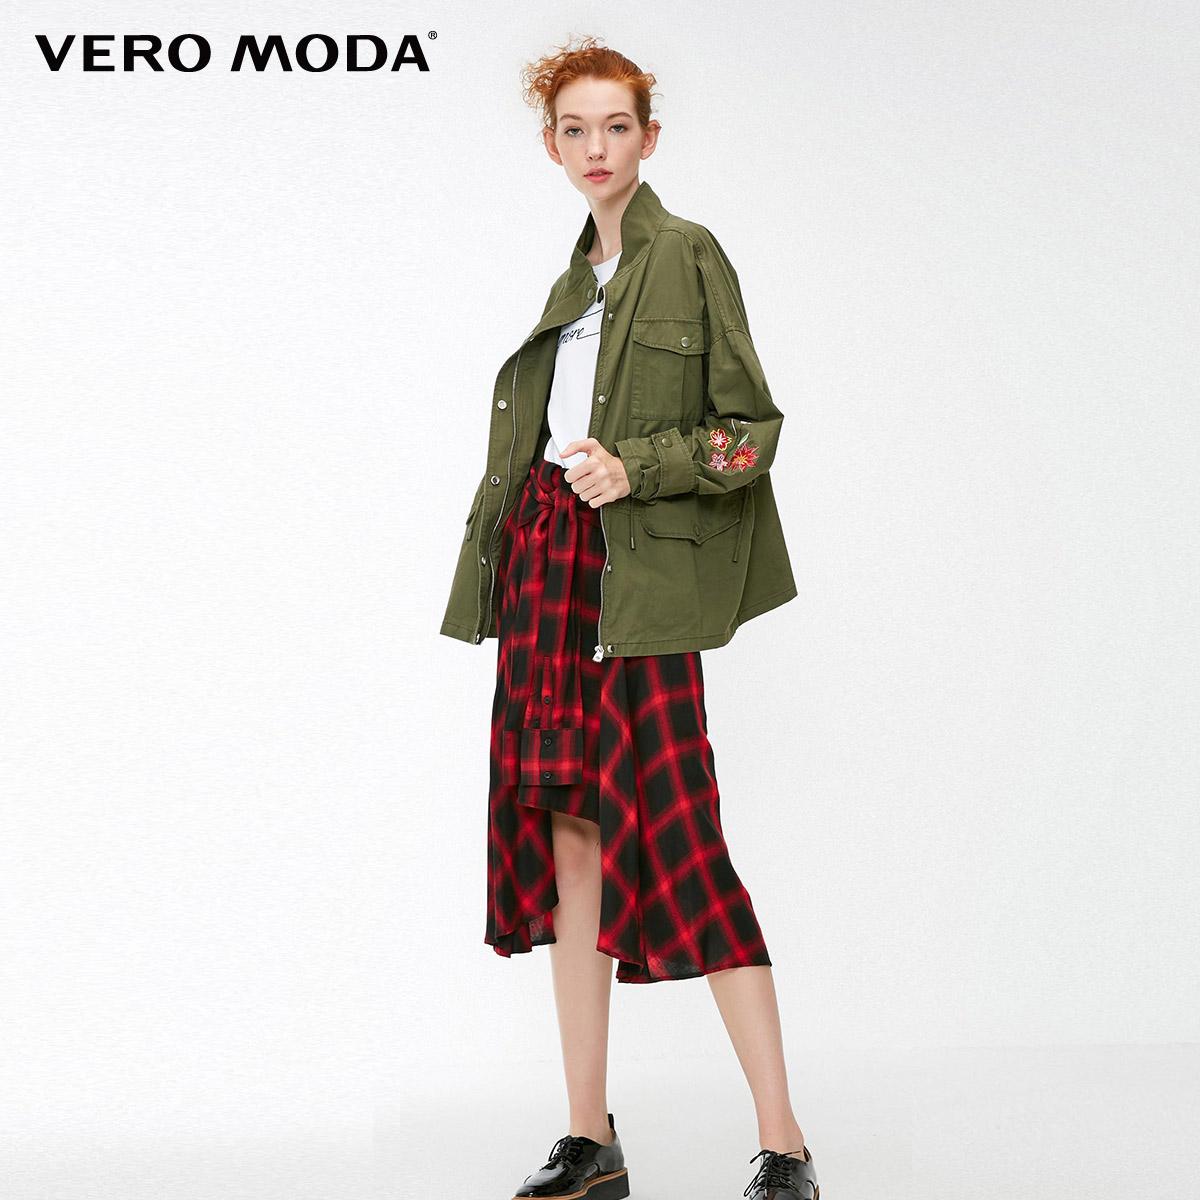 Moda  318321538 秋季花卉抽绳显瘦拉链宽松夹克外套女 绫致 Vero